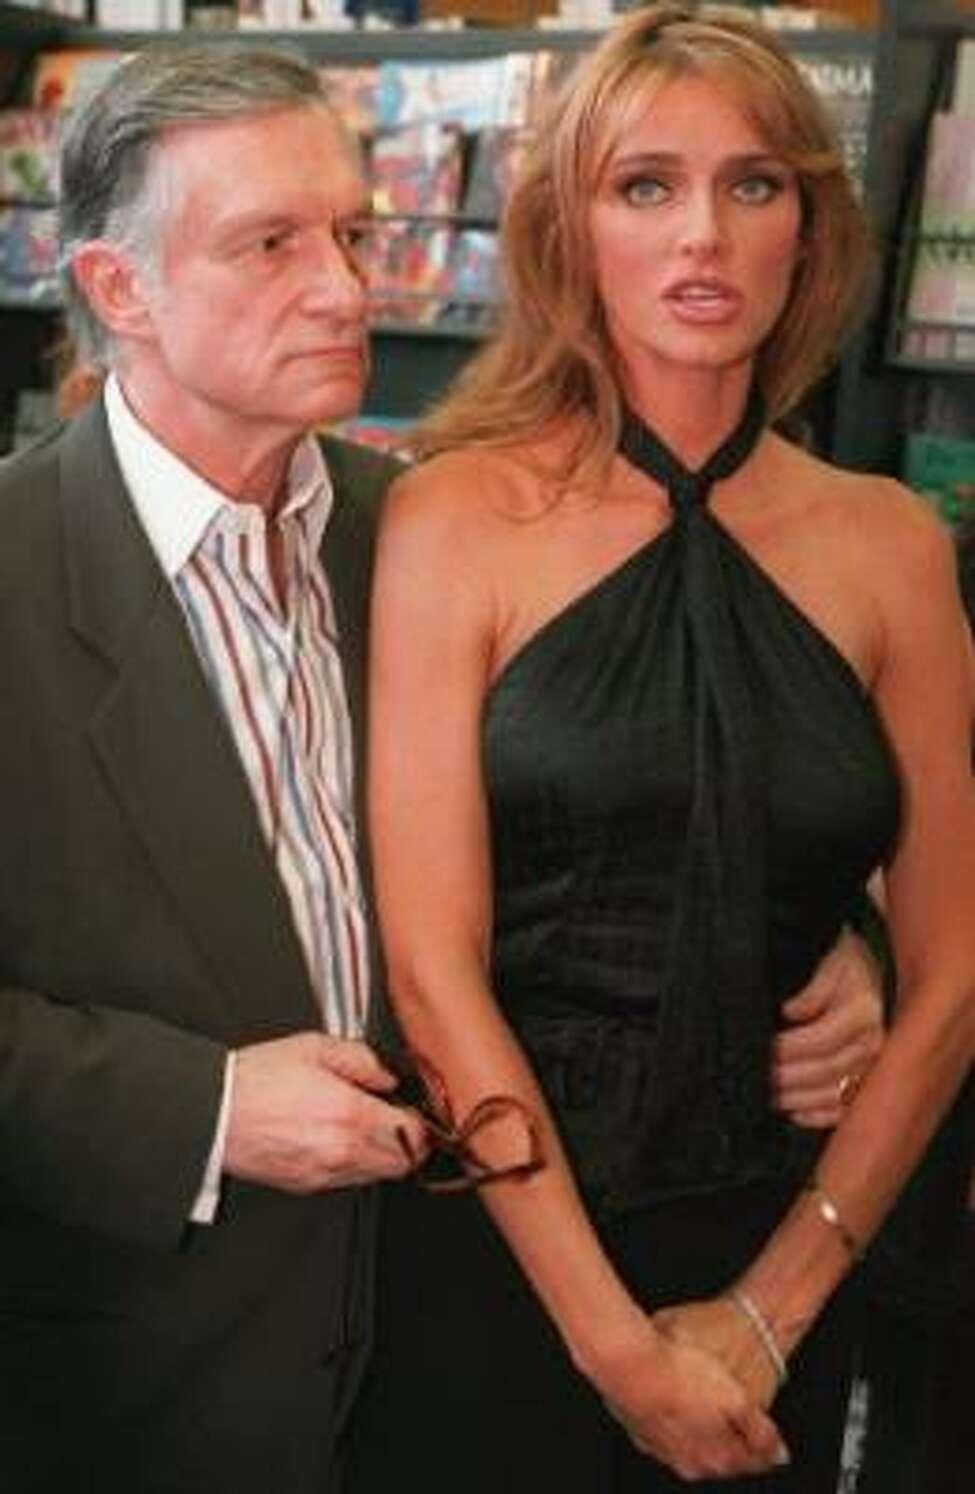 Heartbreak at the Playboy Mansion - Hef Kicks His Twin ... |Hugh Hefner Twin Girlfriends